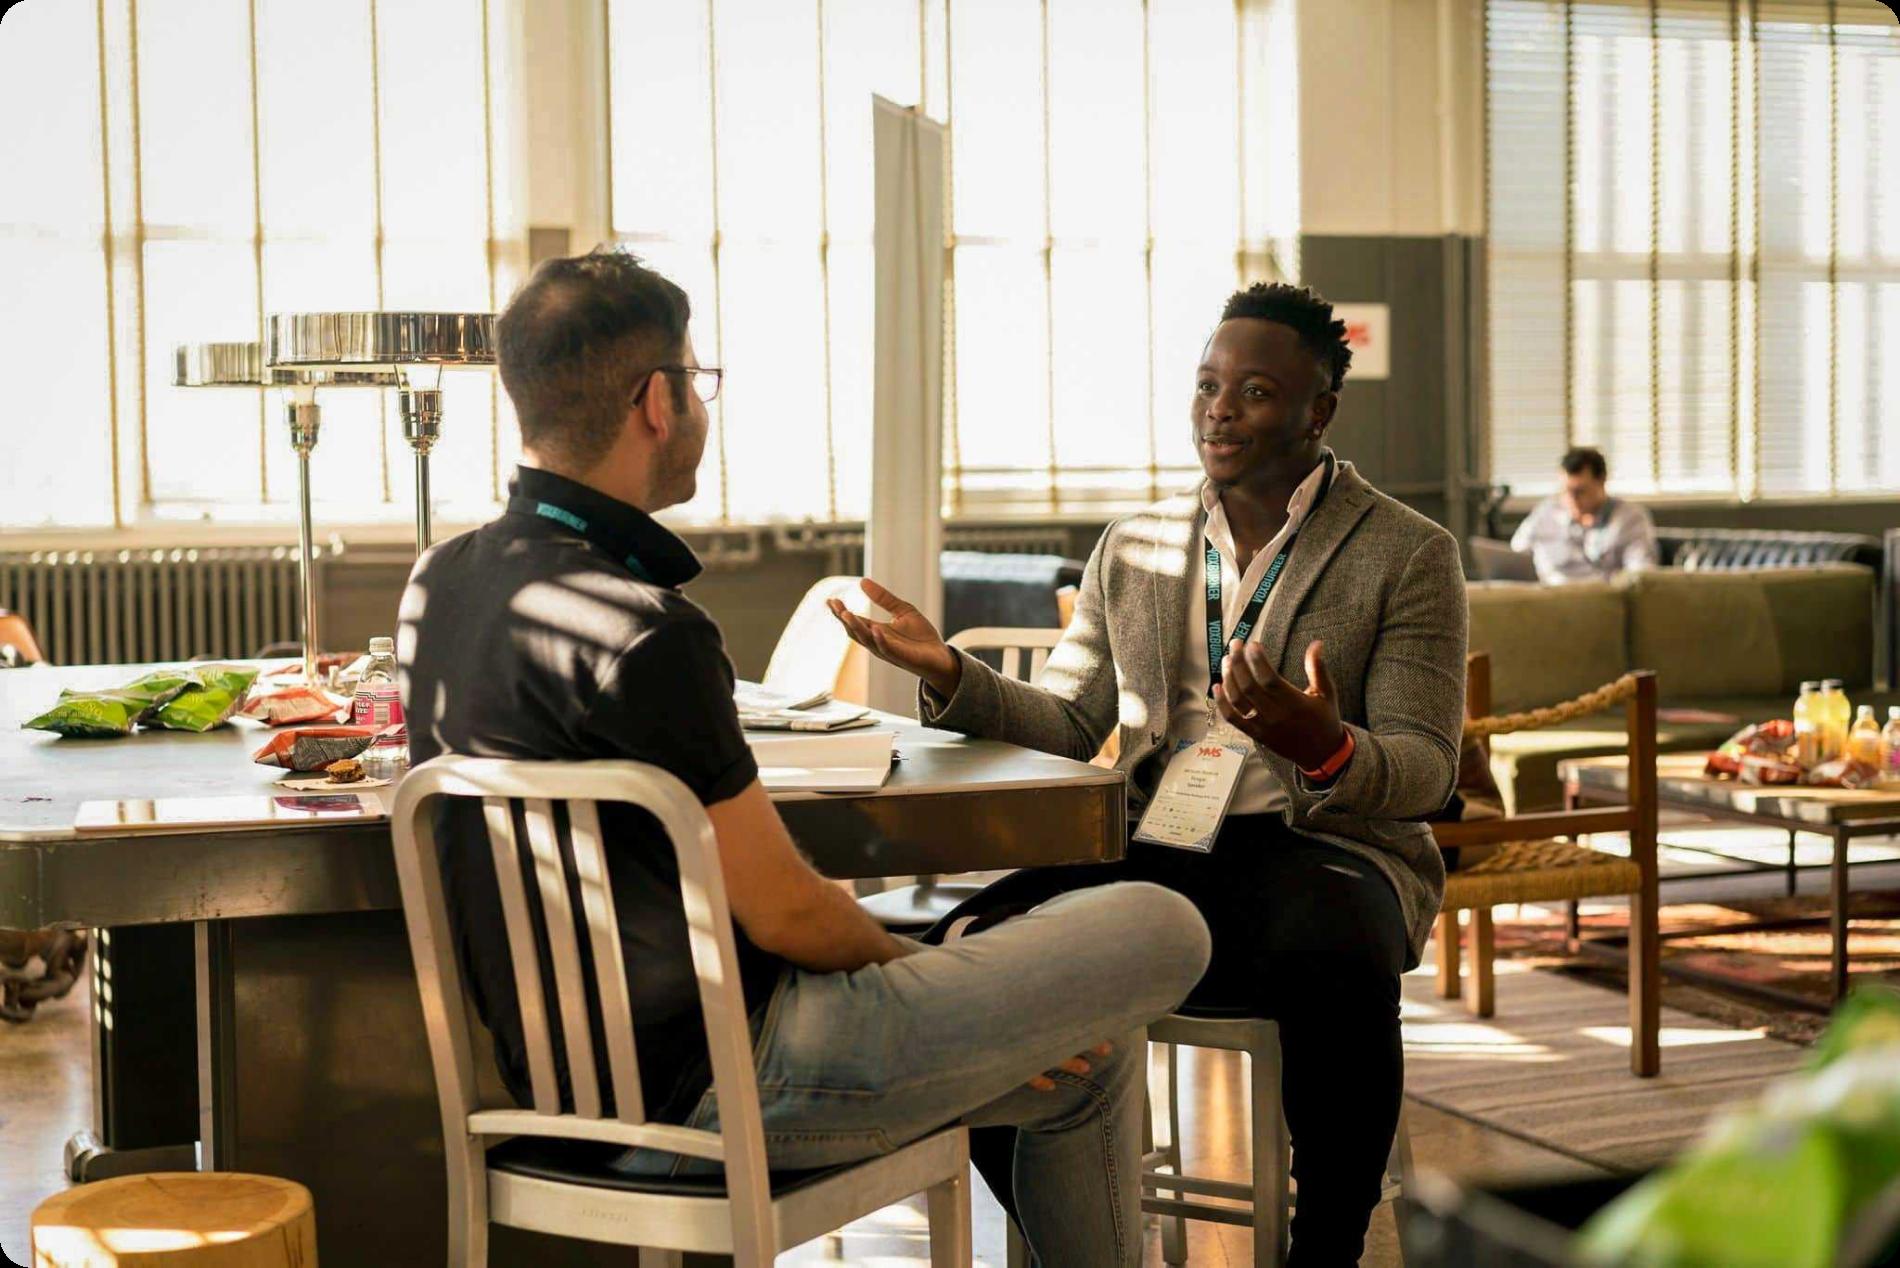 2 men talking at a dinner interview recruiting event